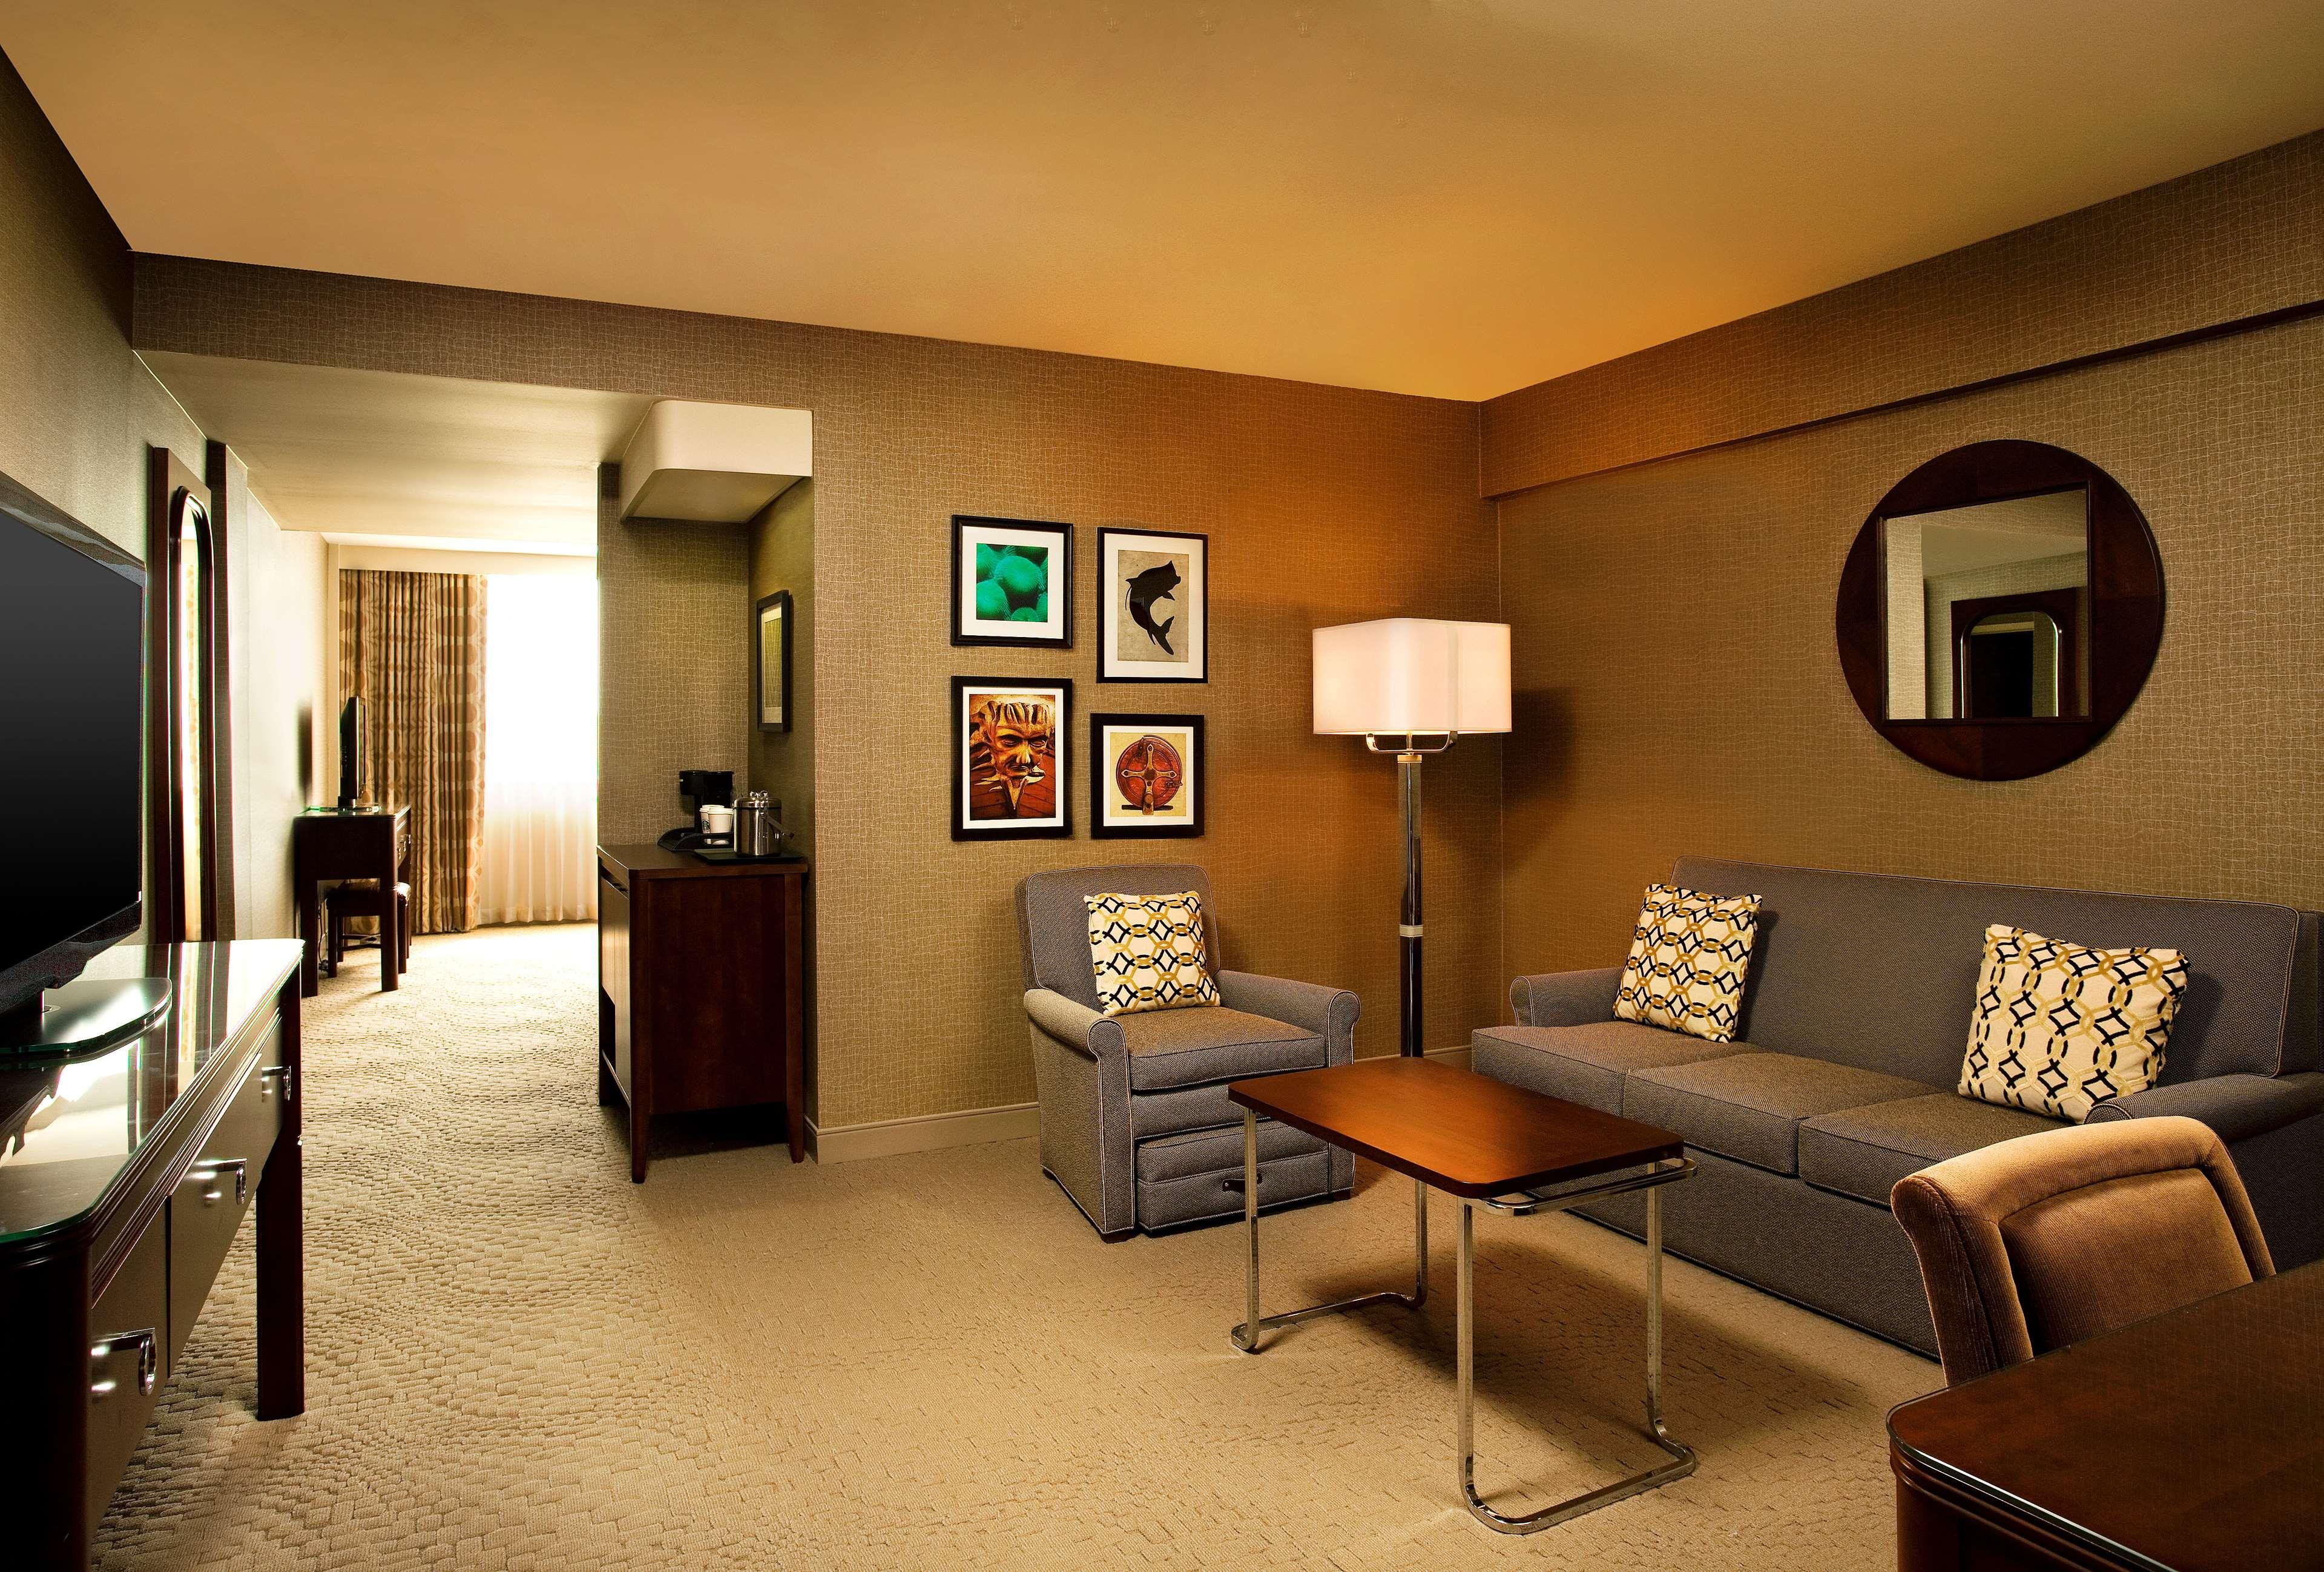 Sheraton Tampa Brandon Hotel image 4